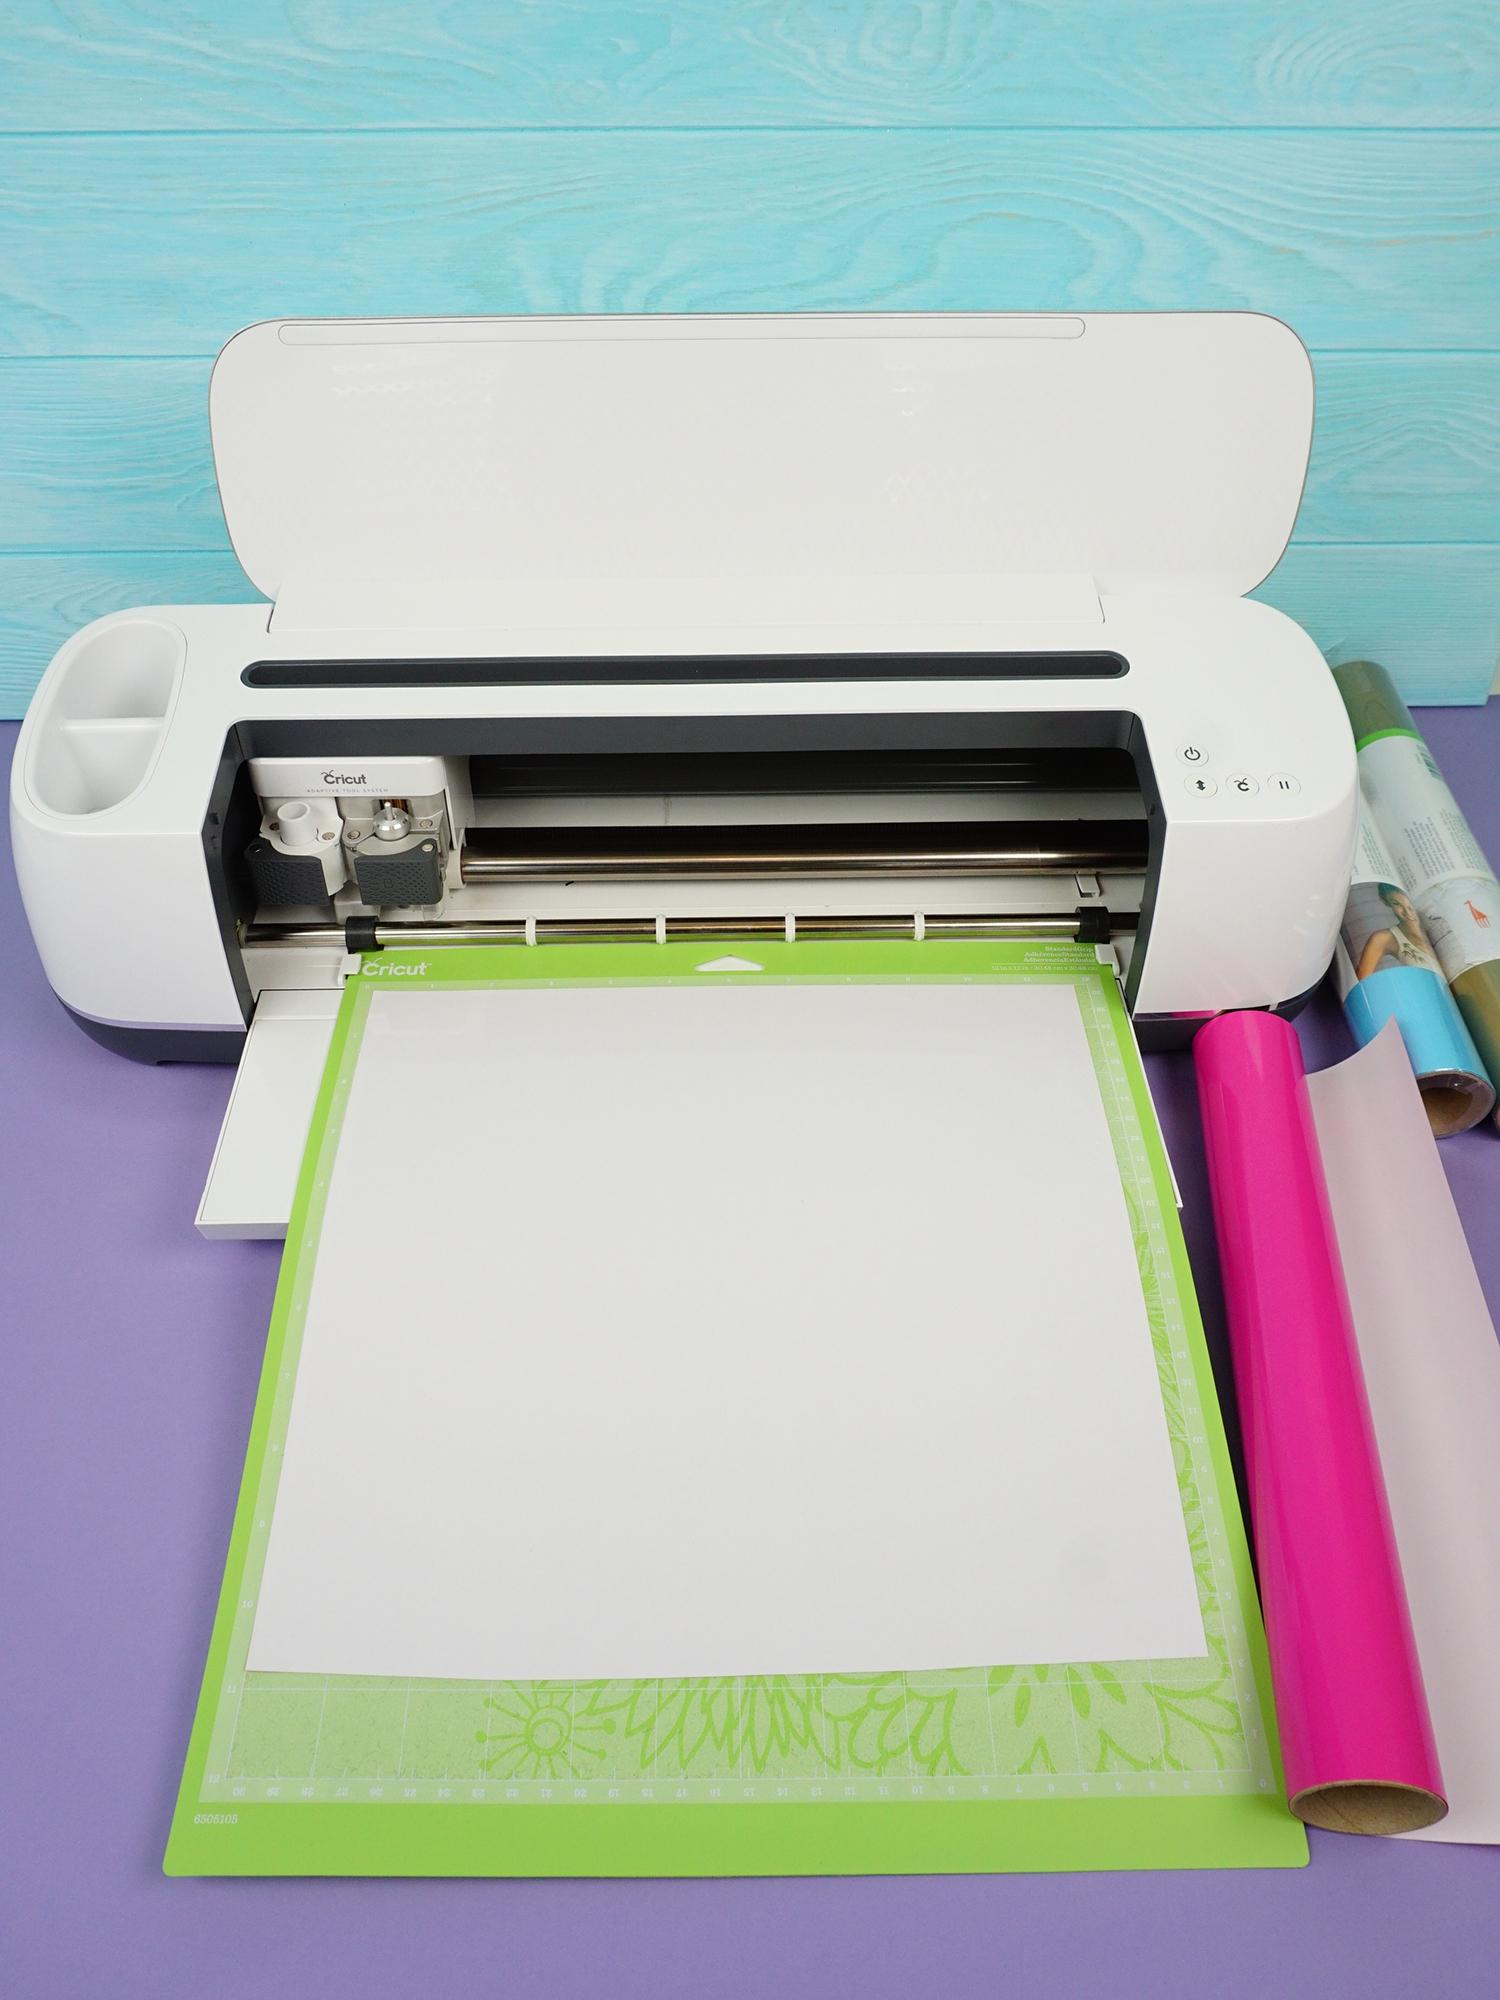 Cricut Maker machine cutting white iron-on vinyl on green mat on purple background